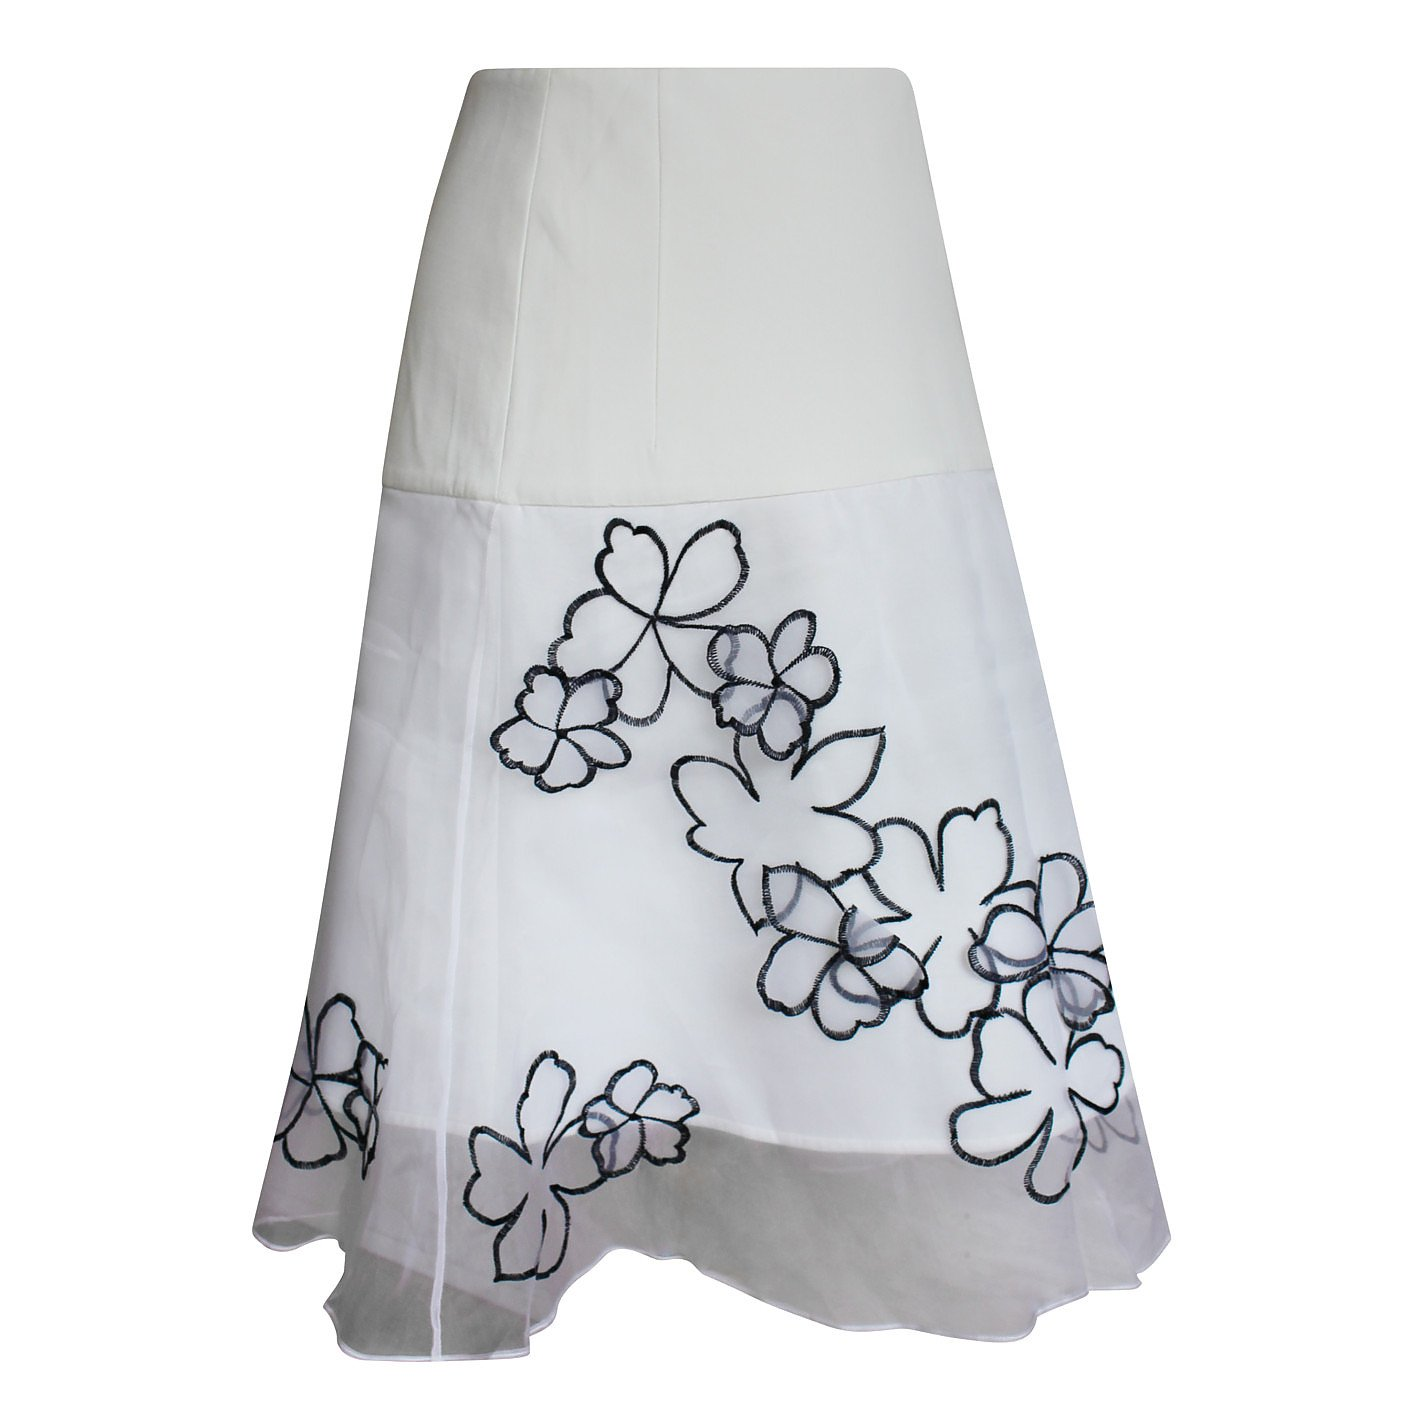 Eudon Choi Floral Appliqué Organza Skirt